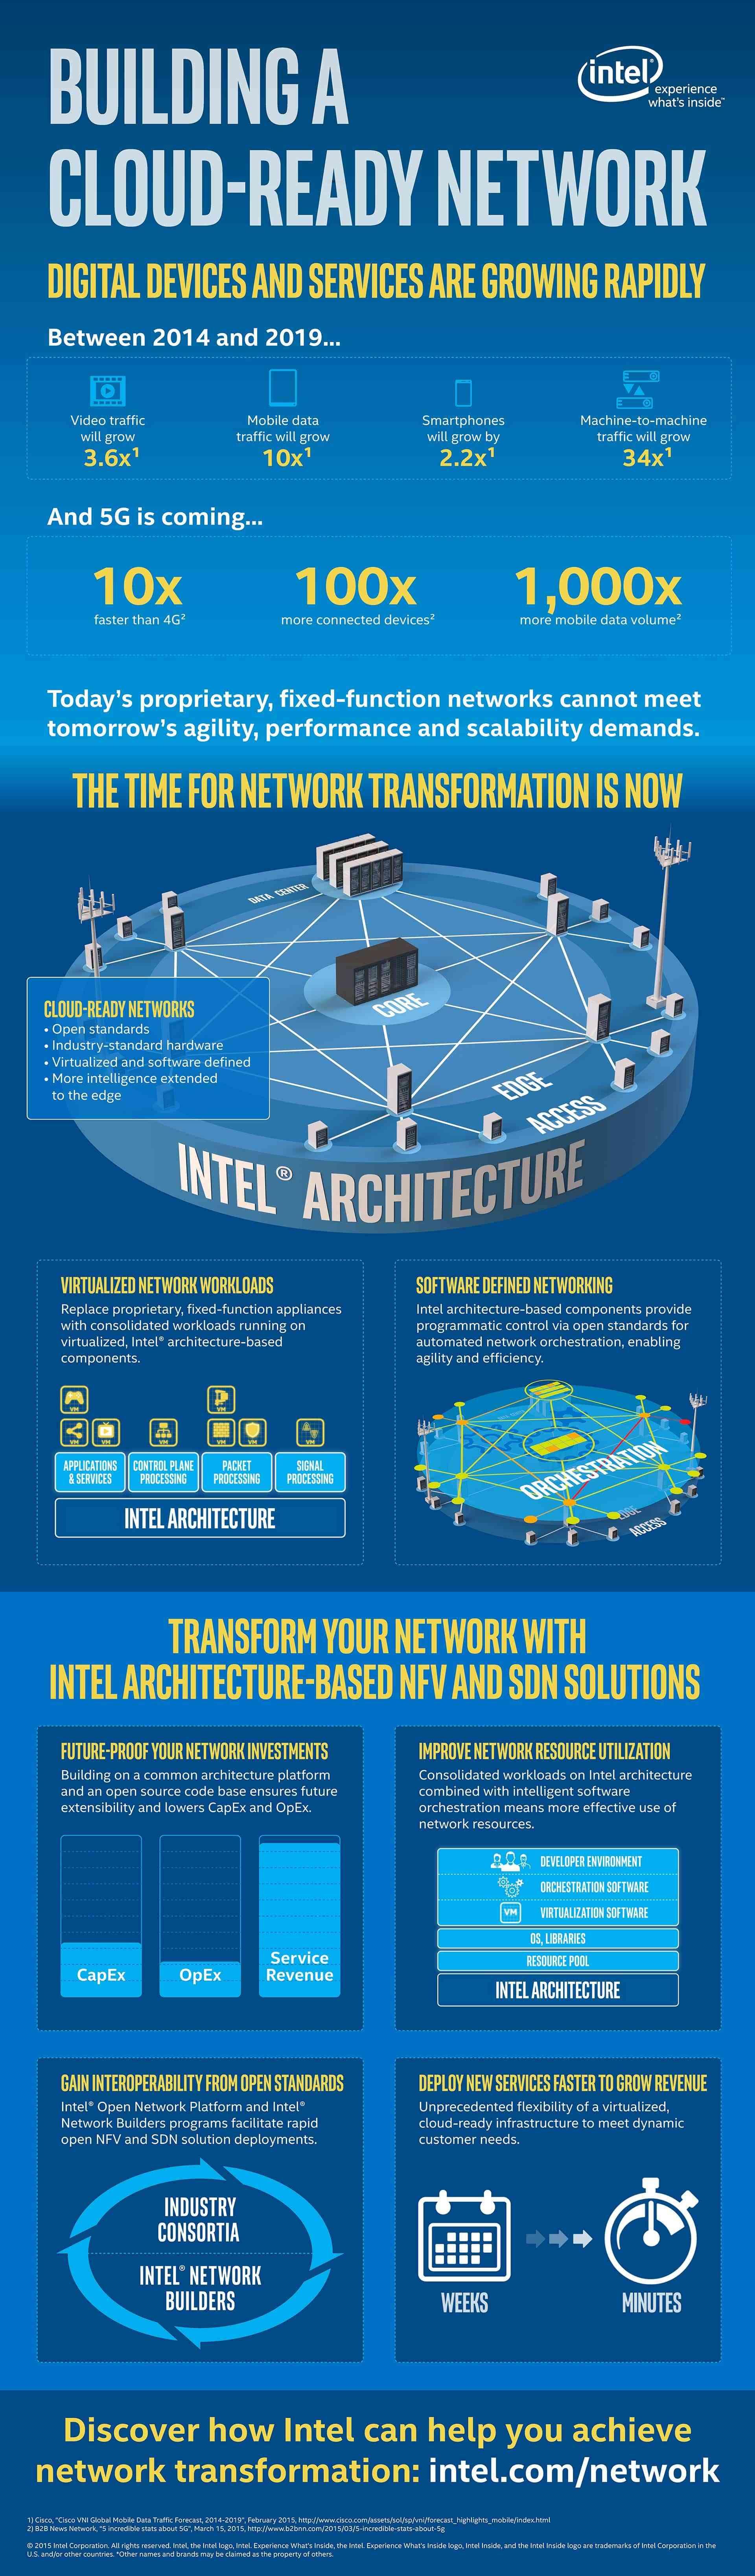 next generation network architecture infographic